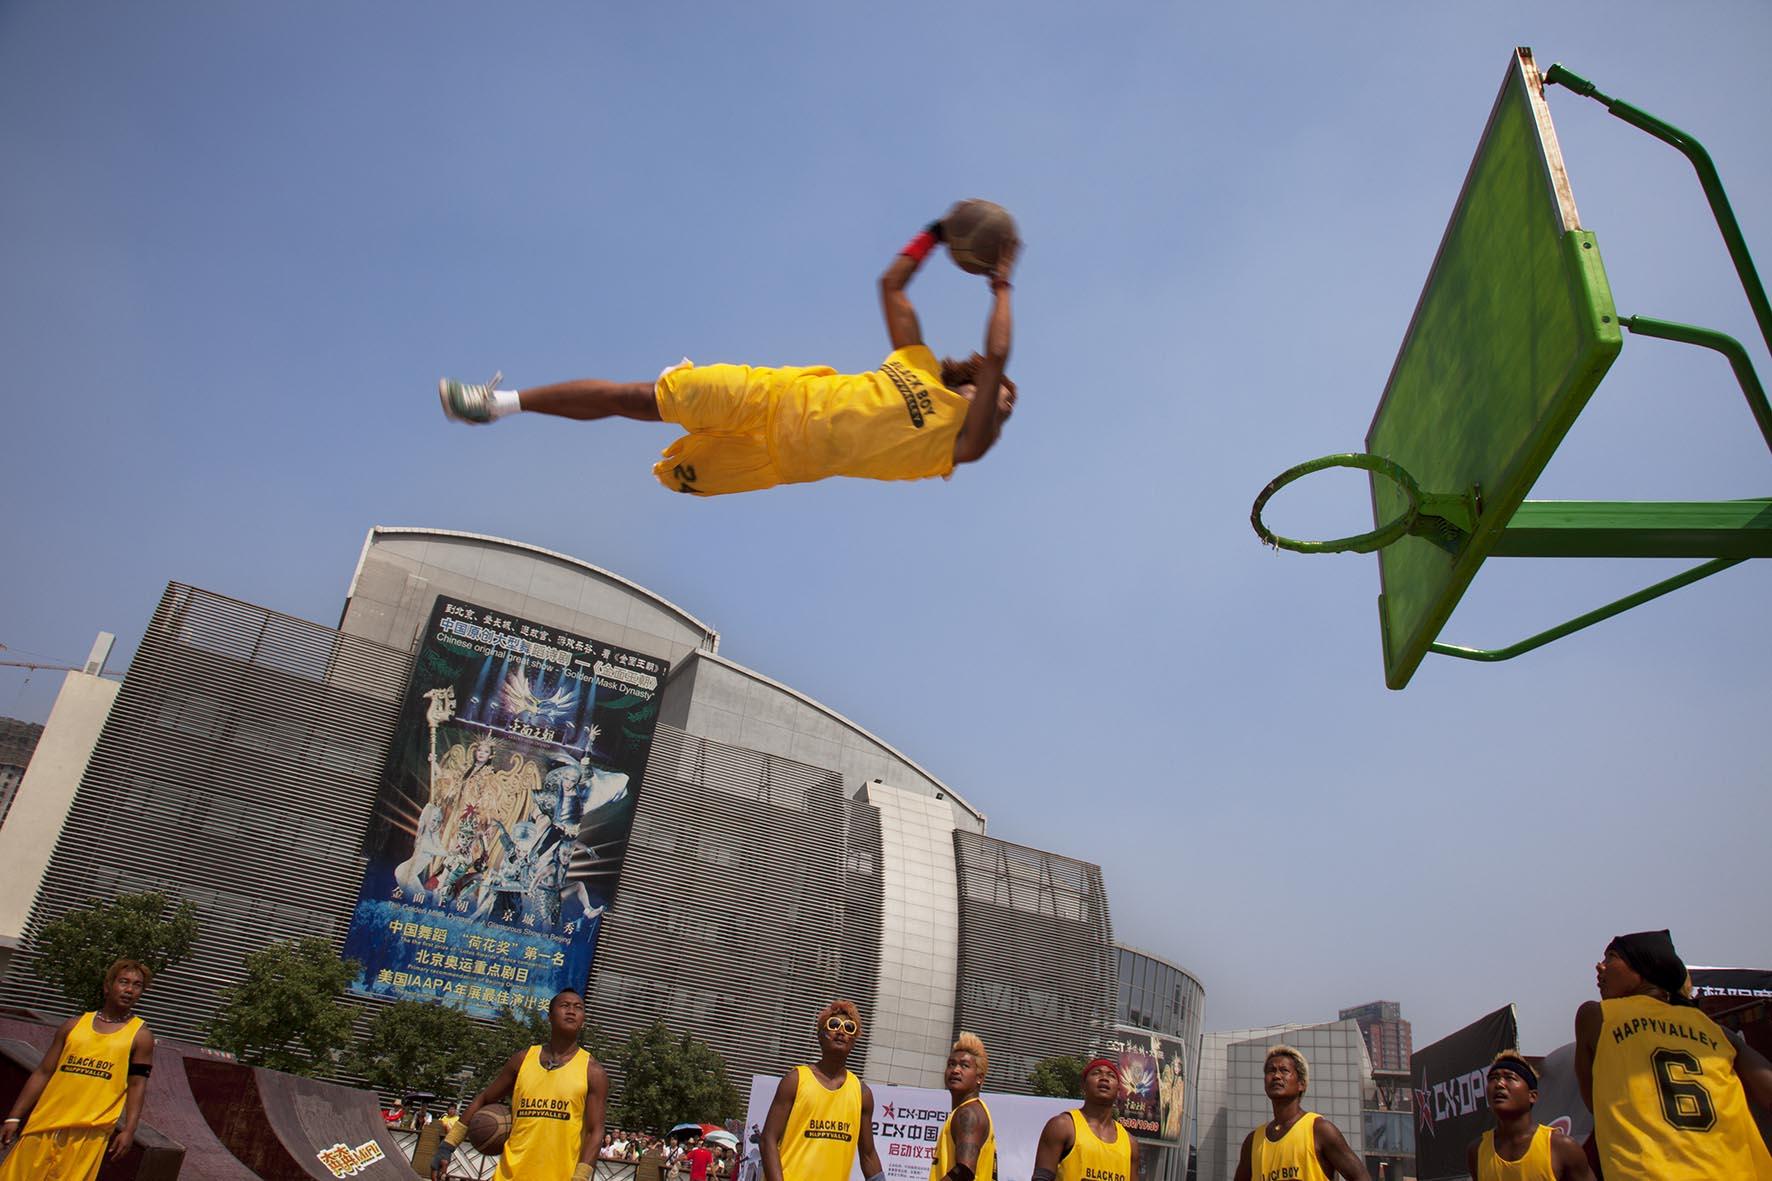 Basketball tricks team perform their slam dunk tricksat Happy Valley amusement park.